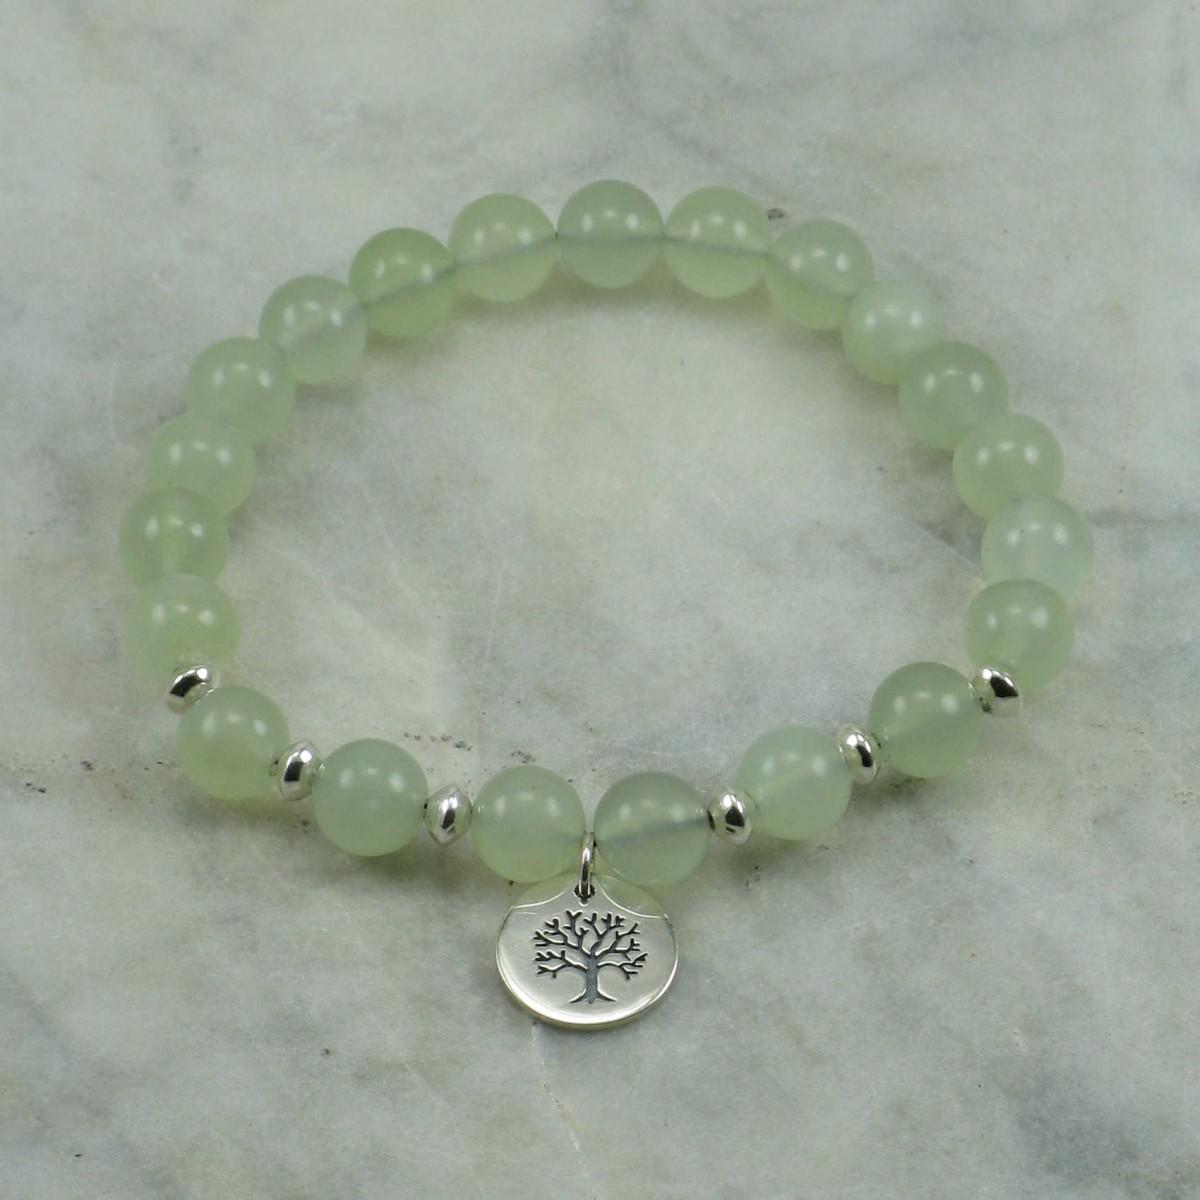 Tree_of_Life_Mala_Bracelet_21_Jade_Mala_Beads_Buddhist_Bracelet